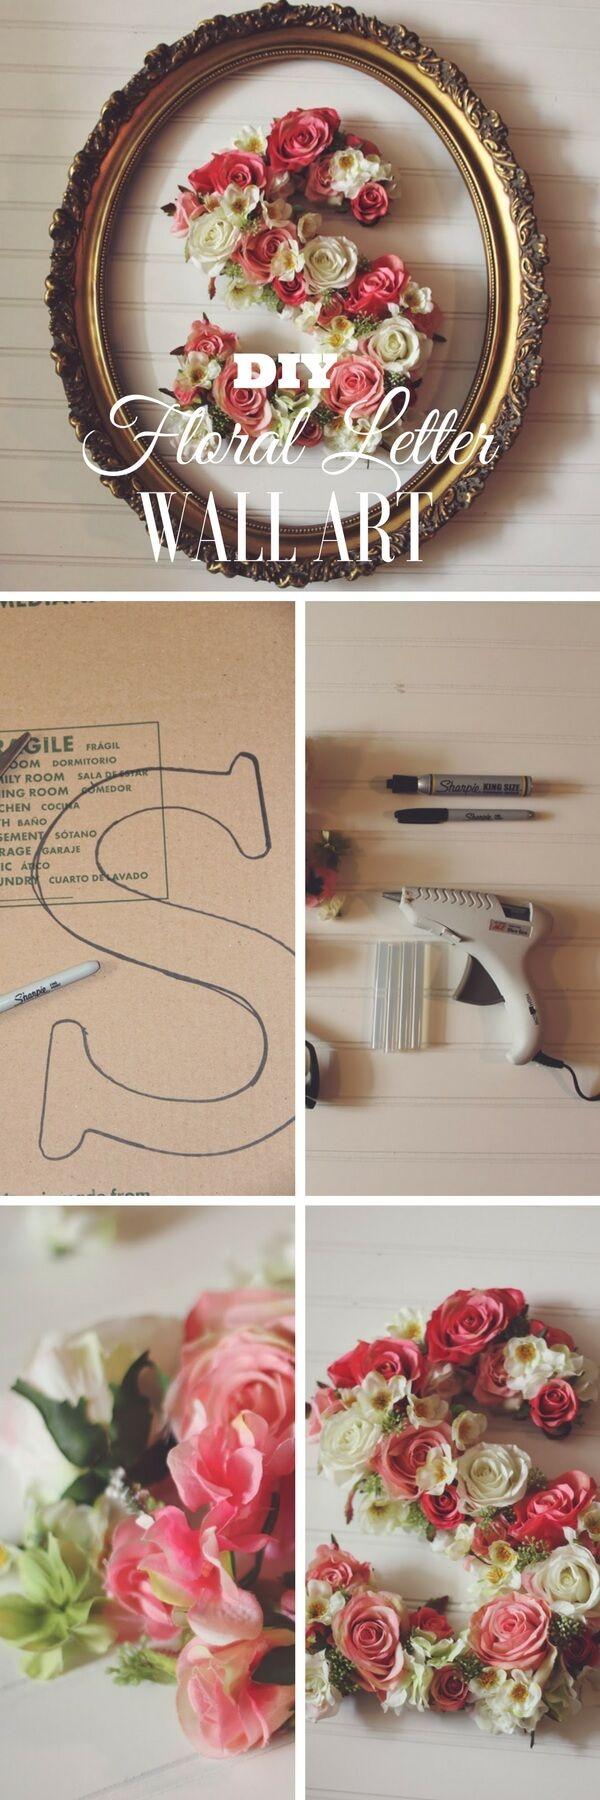 25+ best ideas about Monogram wall art on Pinterest